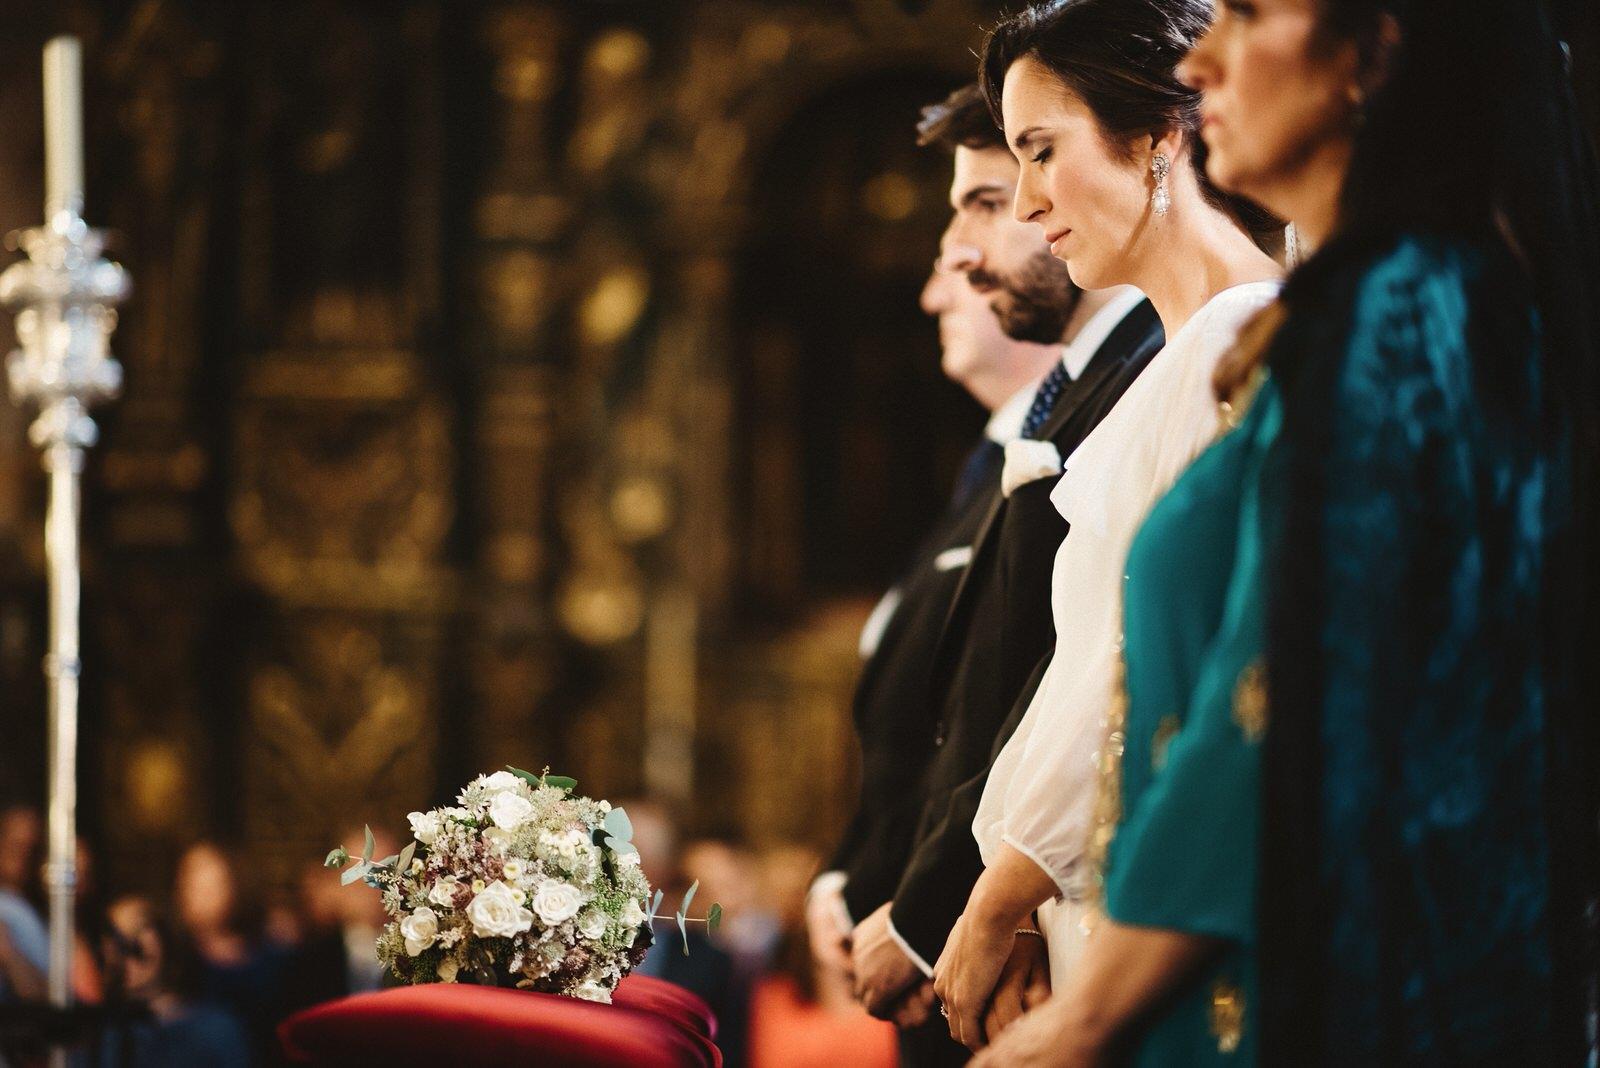 fotografo de bodas sevilla - fotografo boda - fotografía sevilla - Andrés AmarilloAAA_4729- tele- fine.JPG